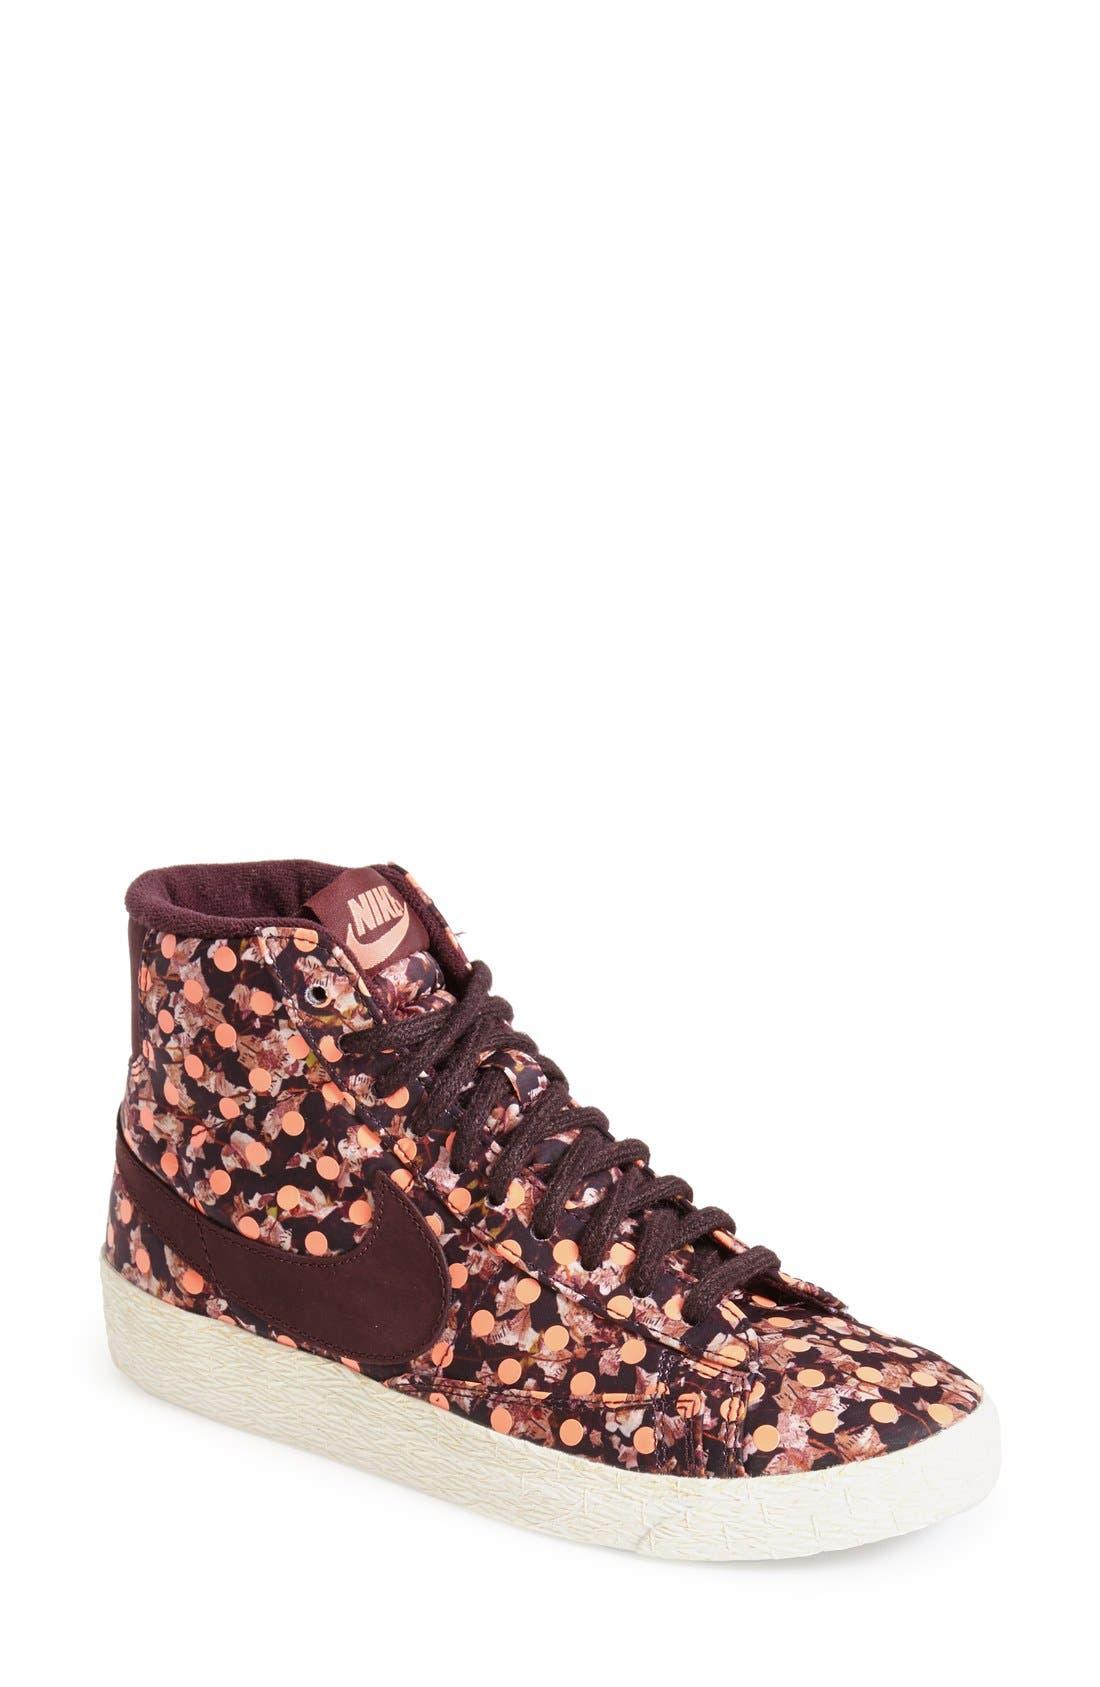 'Mid Vintage Liberty' Sneaker,                         Main,                         color, Burgundy